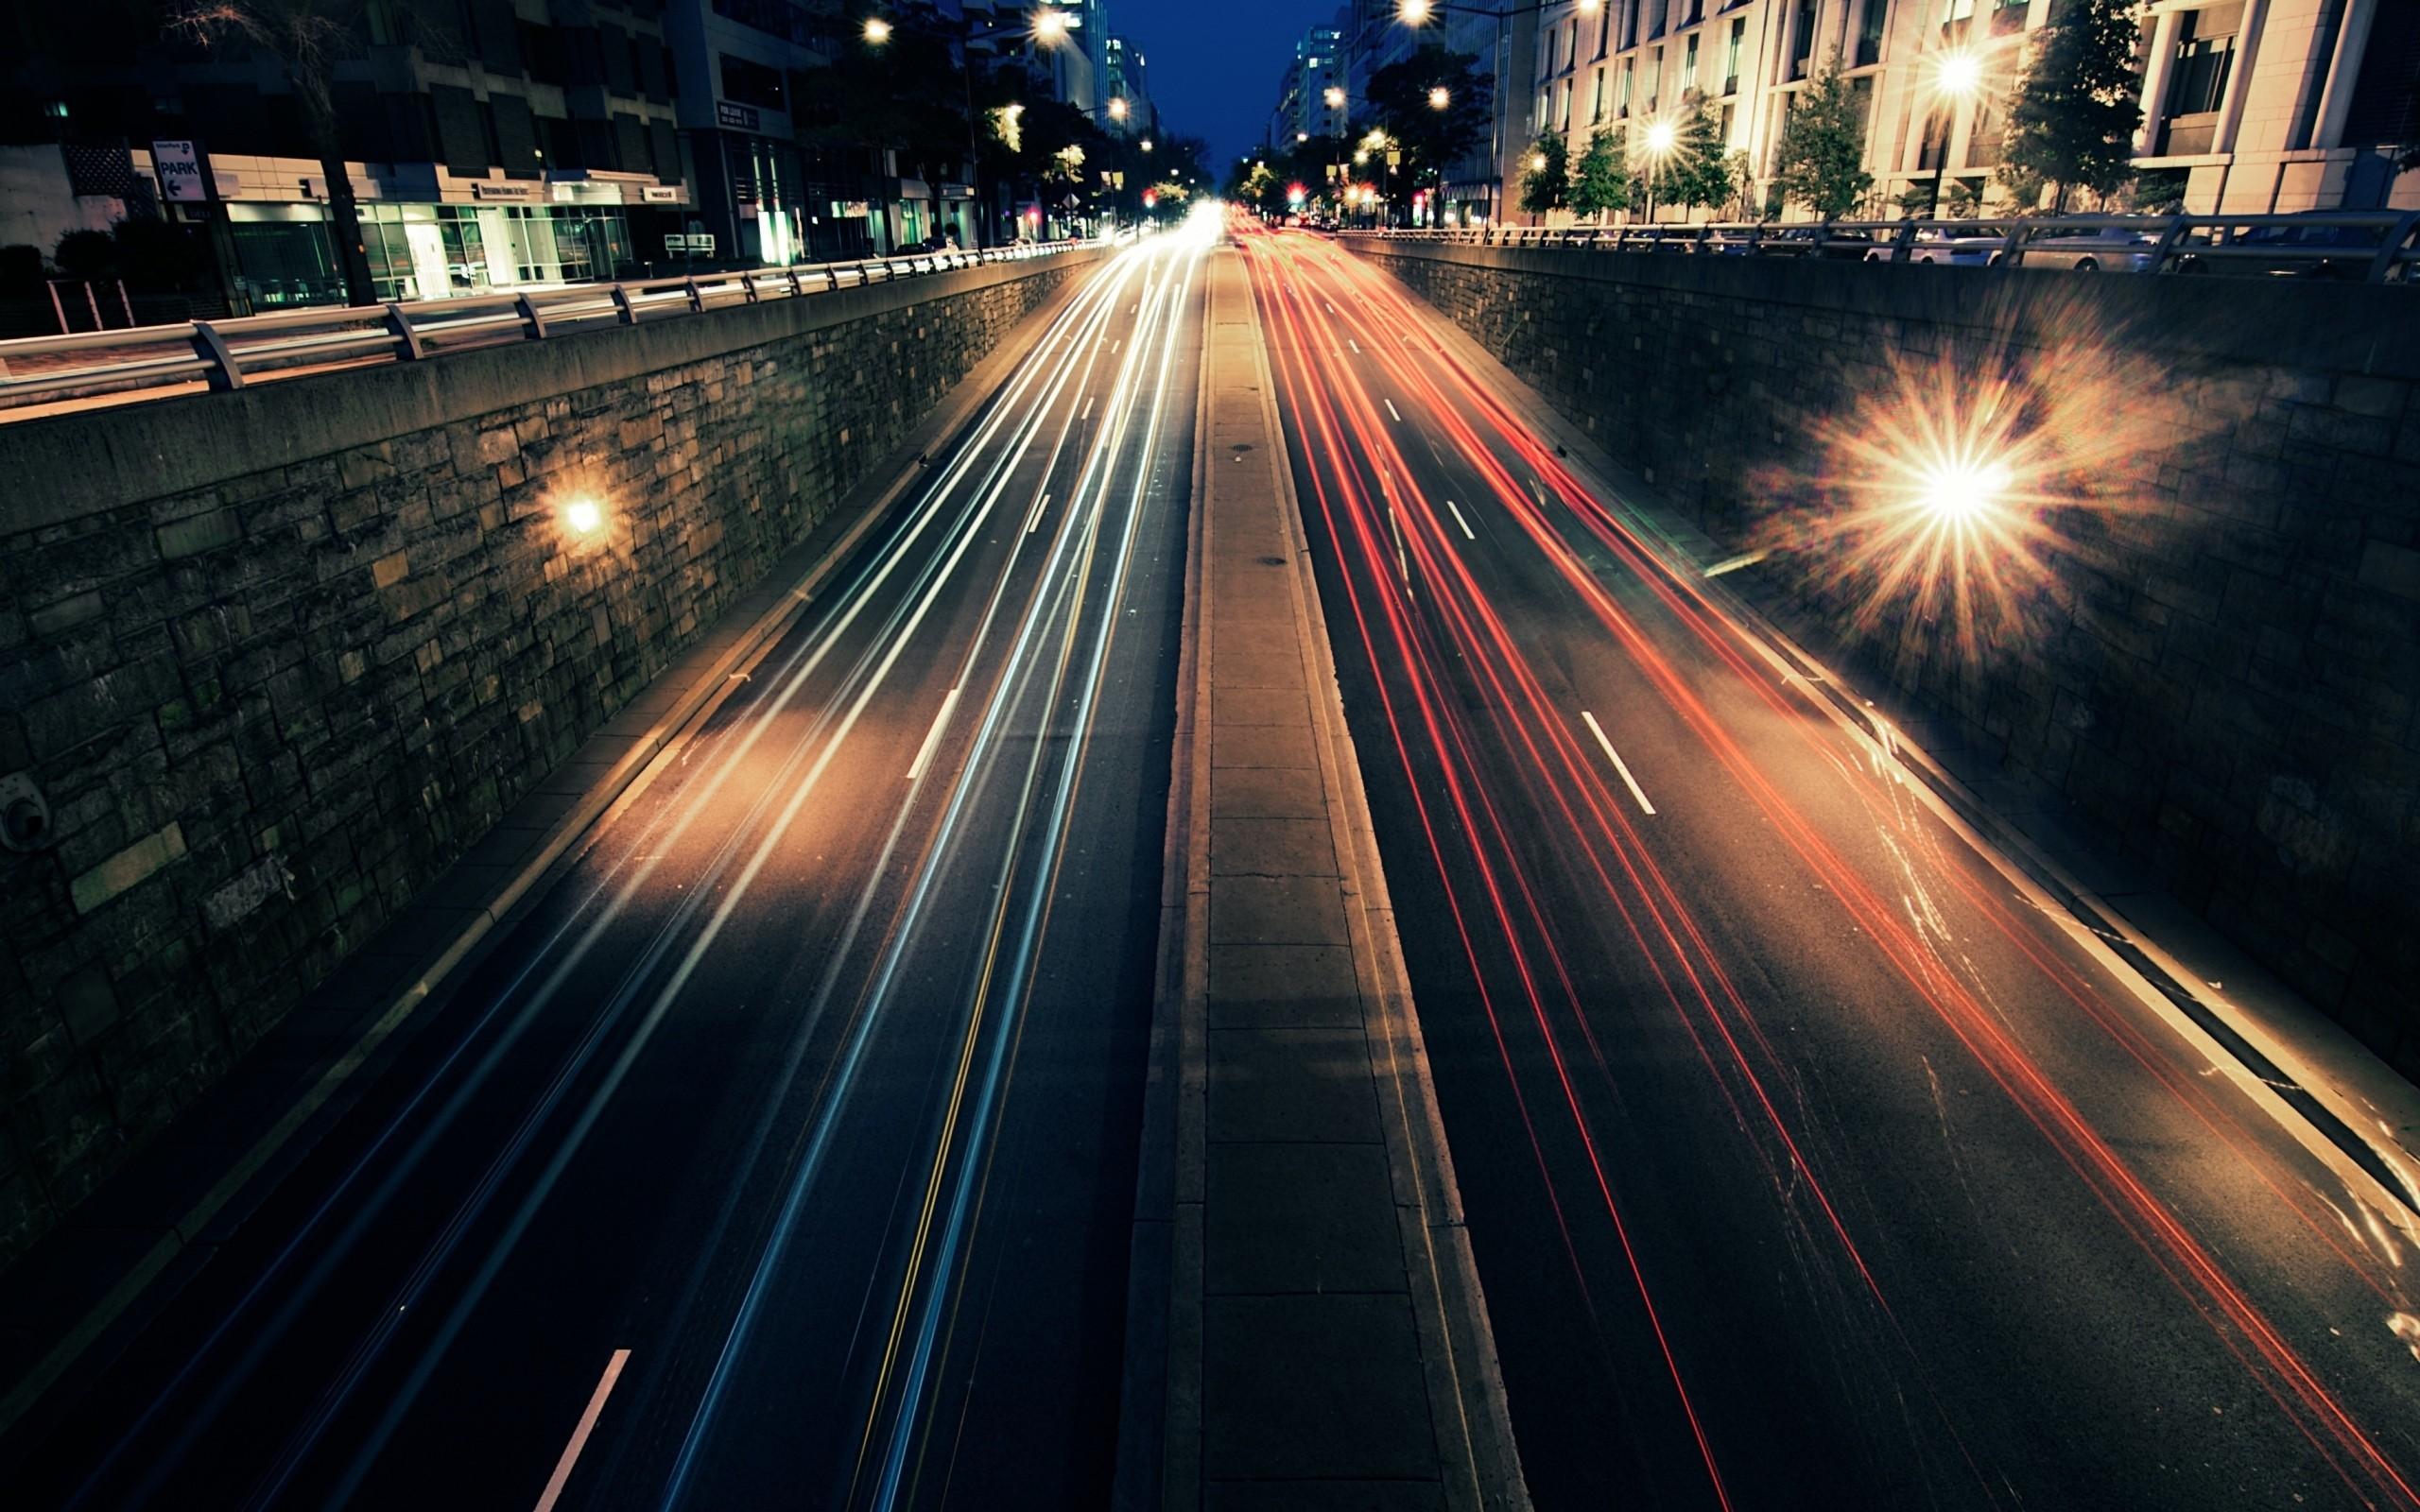 General 2560x1600 urban road city long exposure wall light trails cityscape traffic